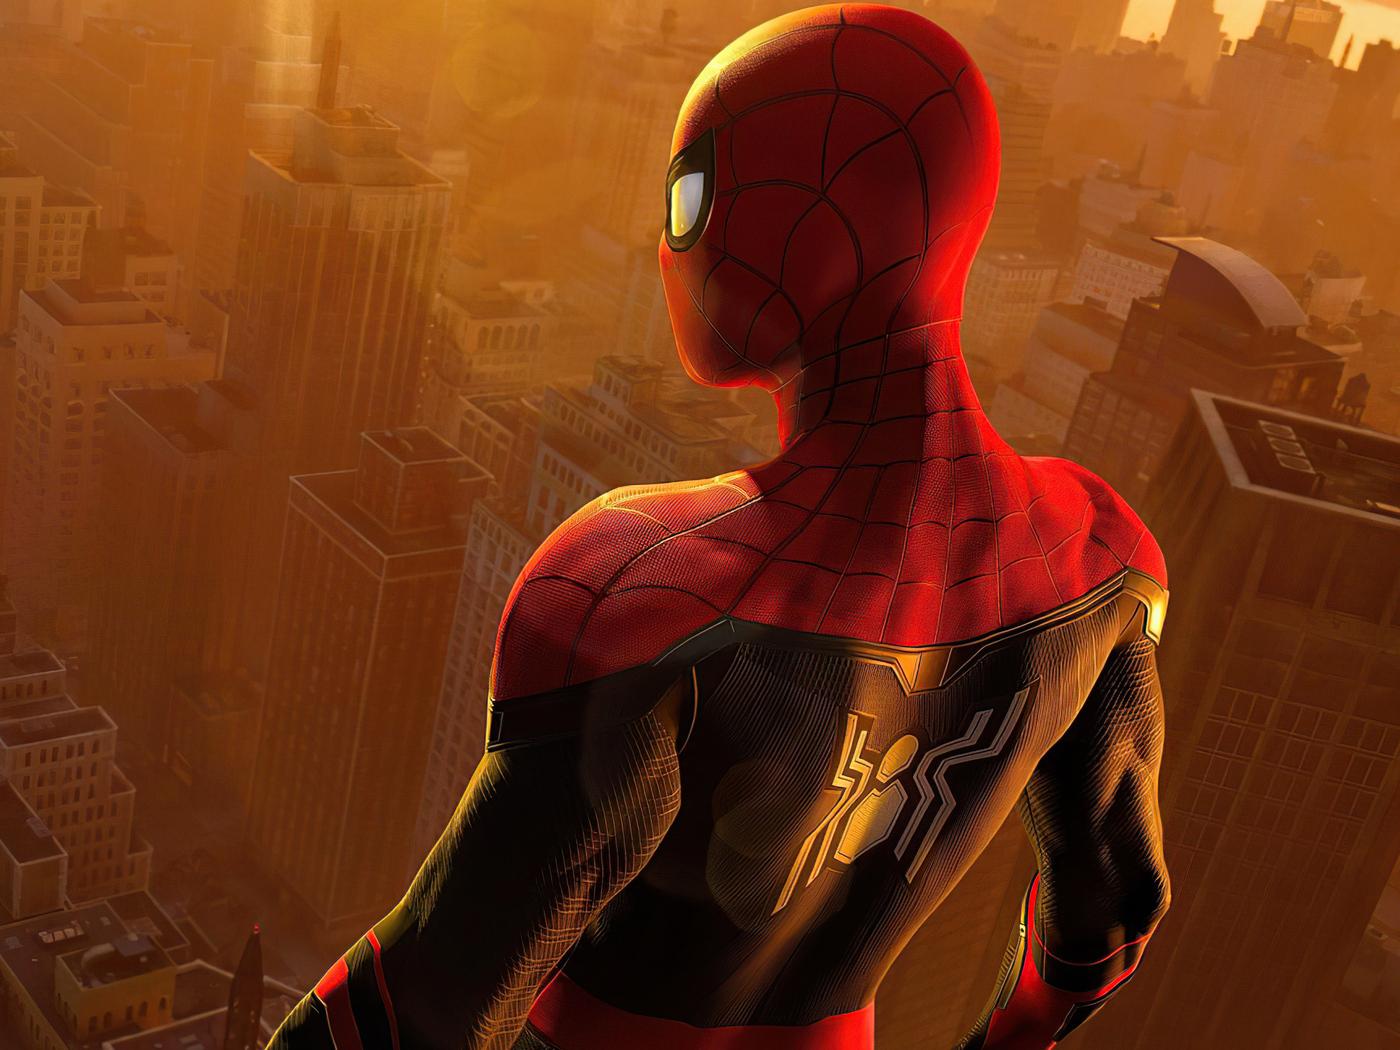 spiderman-ps5-on-top-2021-jk.jpg